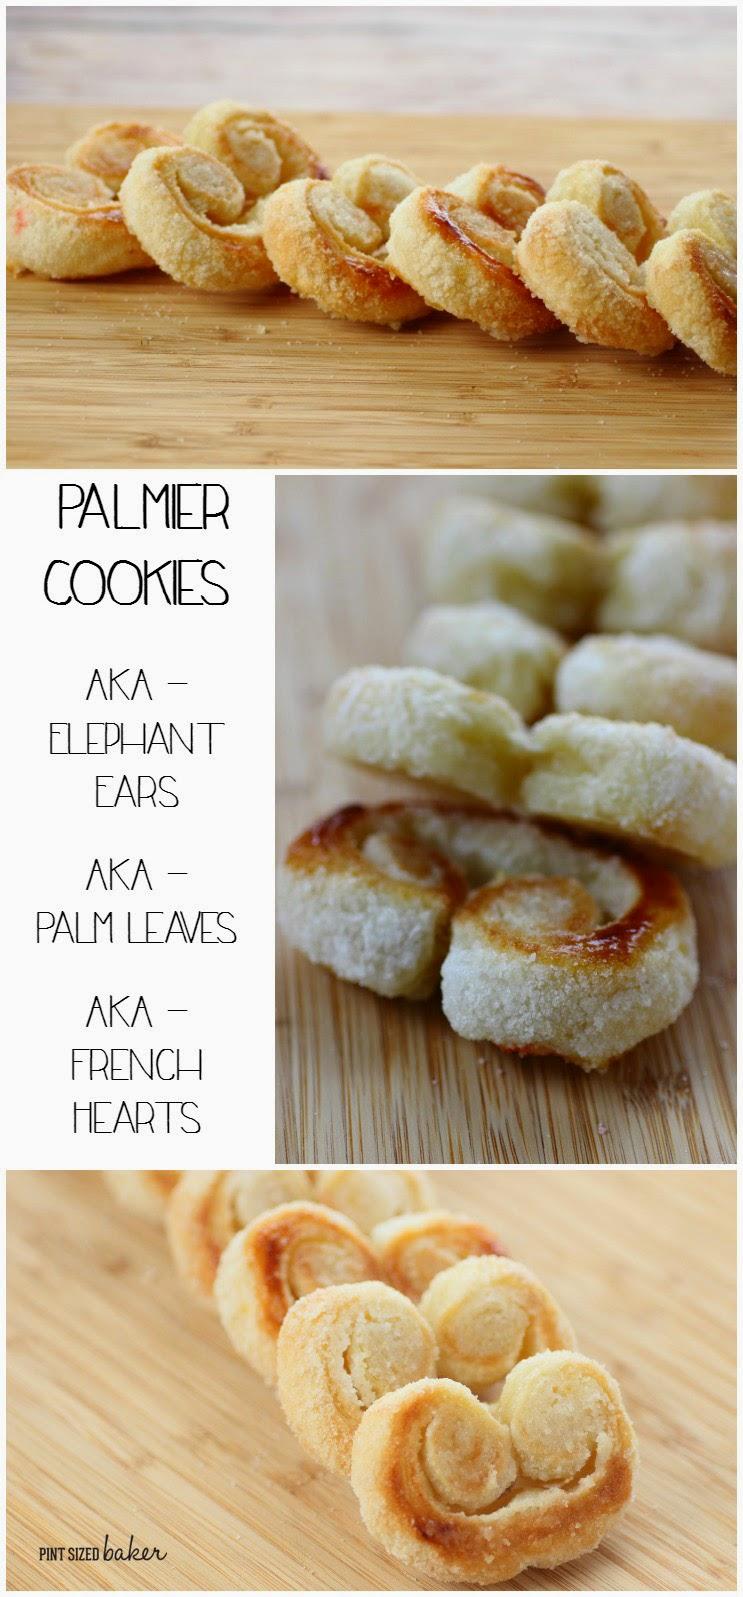 Palmier Cookies - AKA Elephant Ears - AKA Palm Leaves - AKA French Hearts. Whatever you call them, they're GREAT!